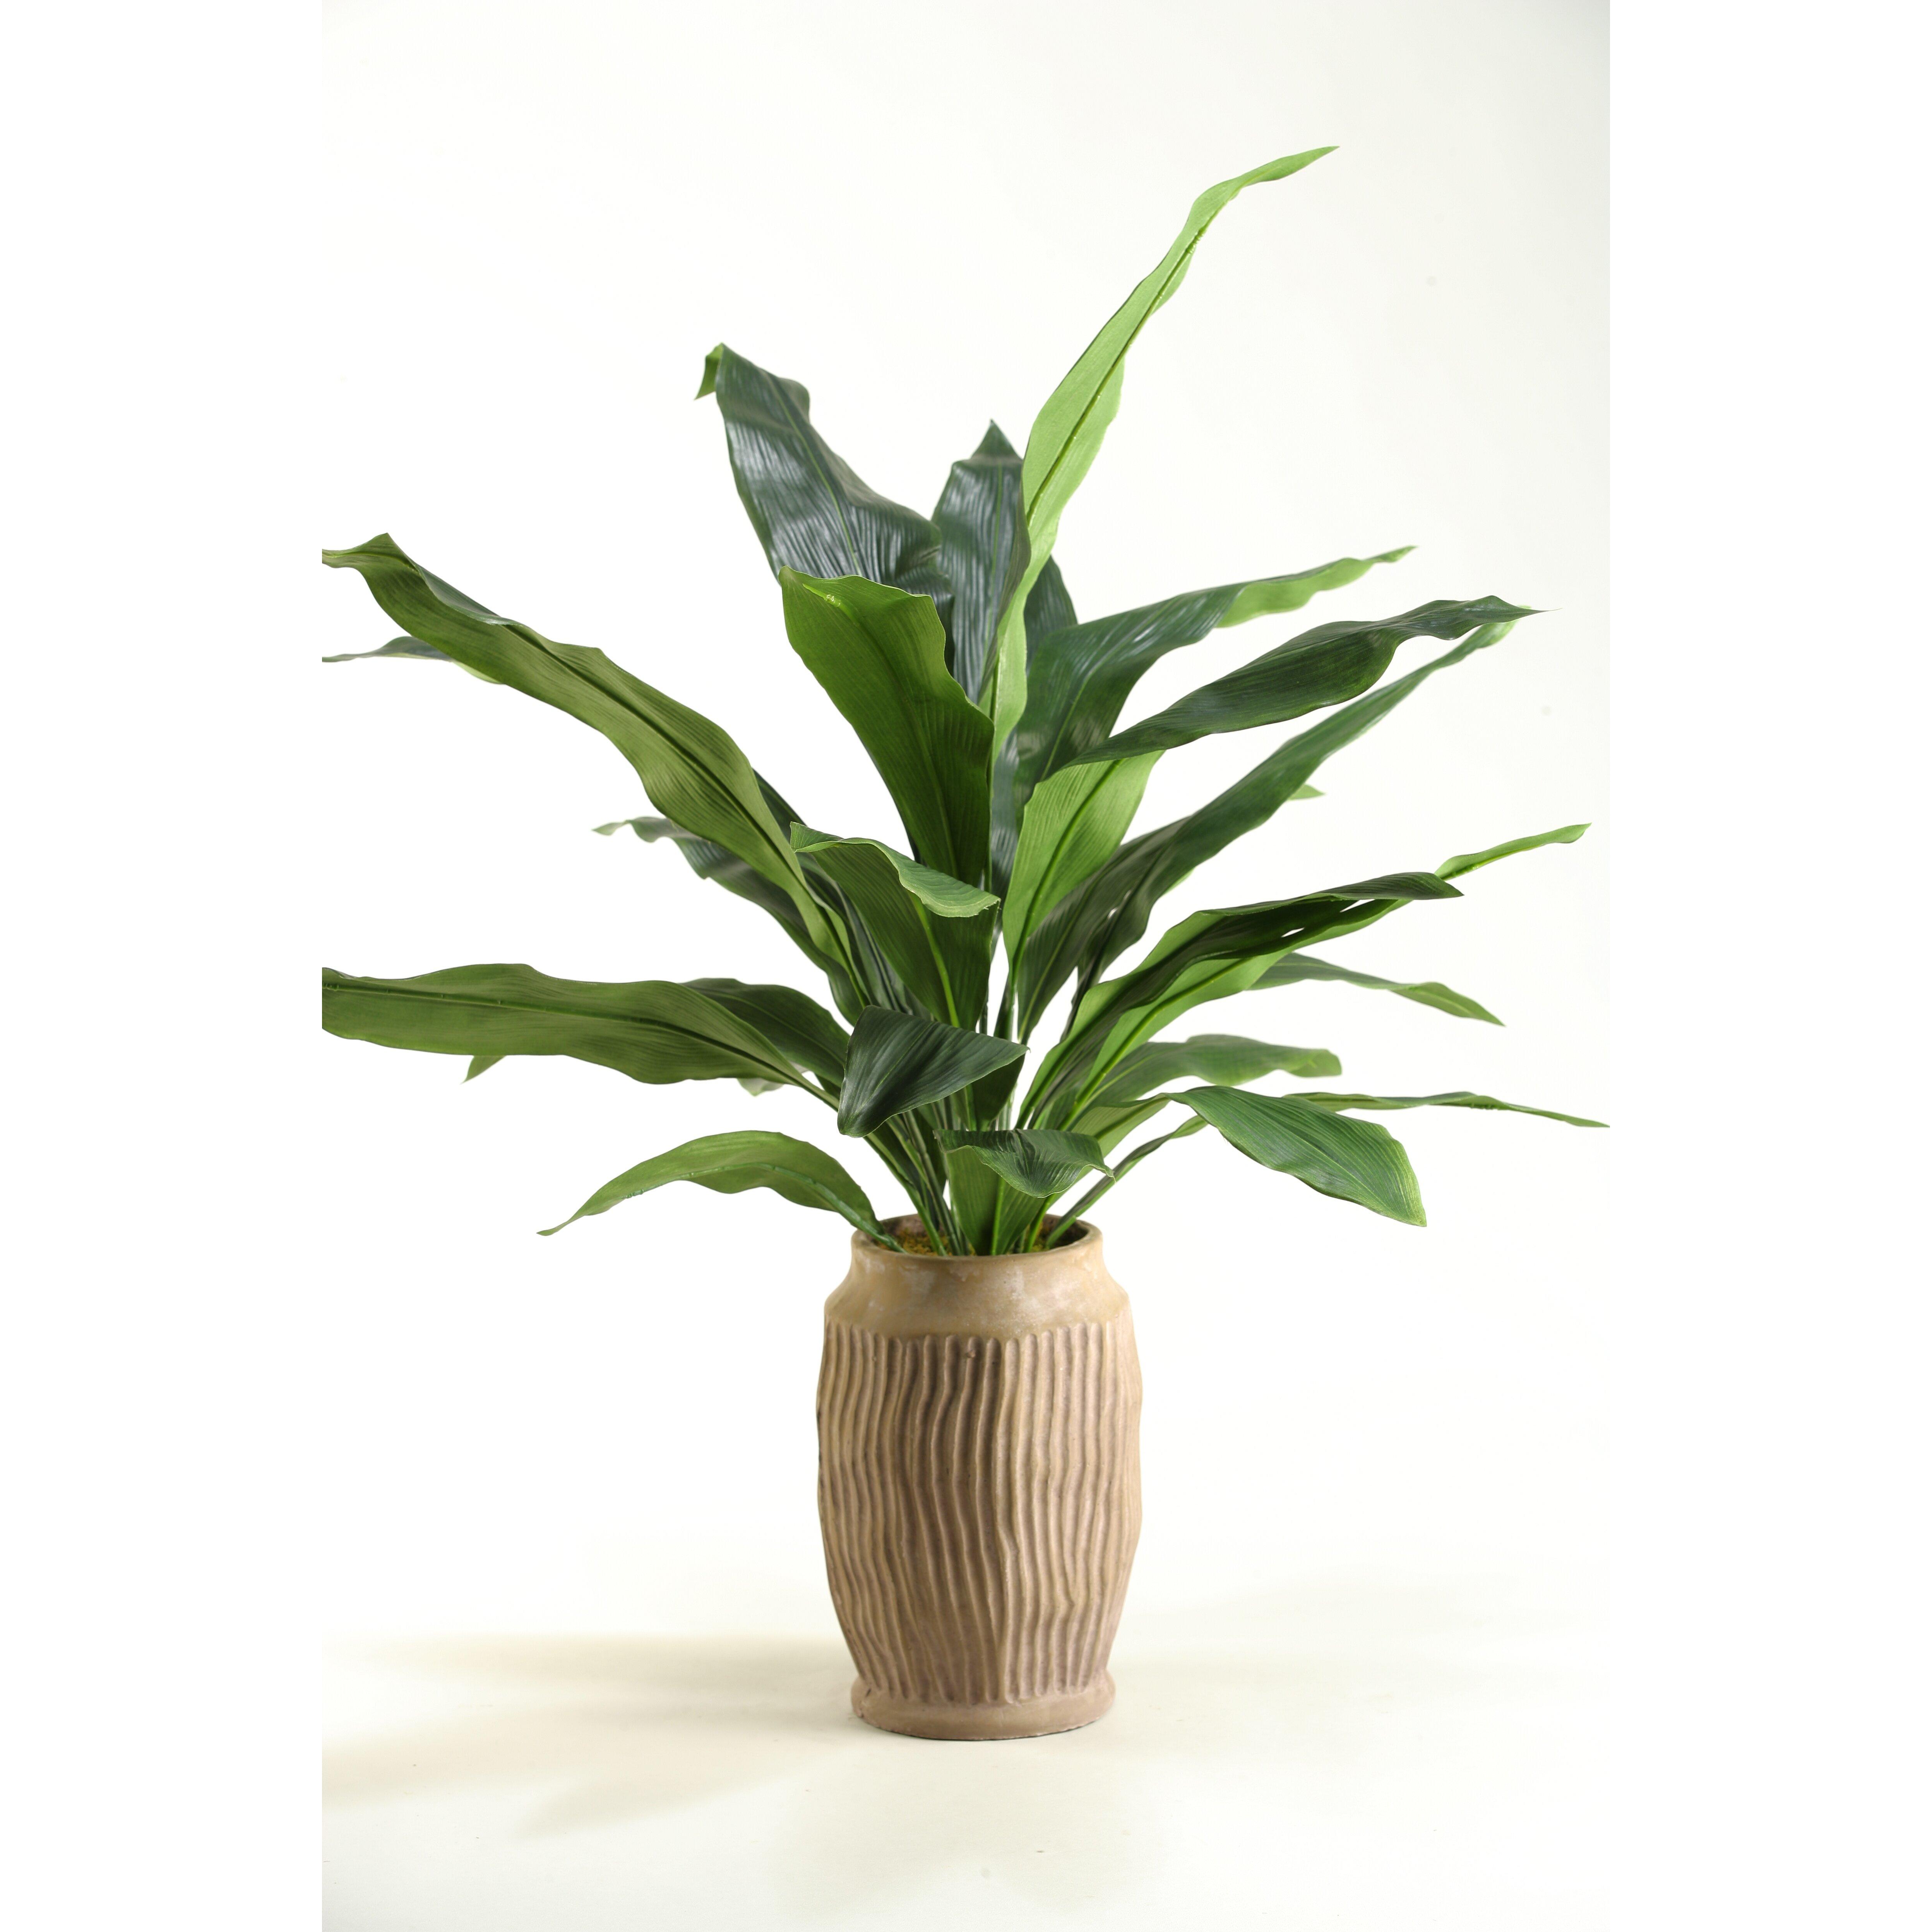 Cast Iron Desk Top Plant in Vase